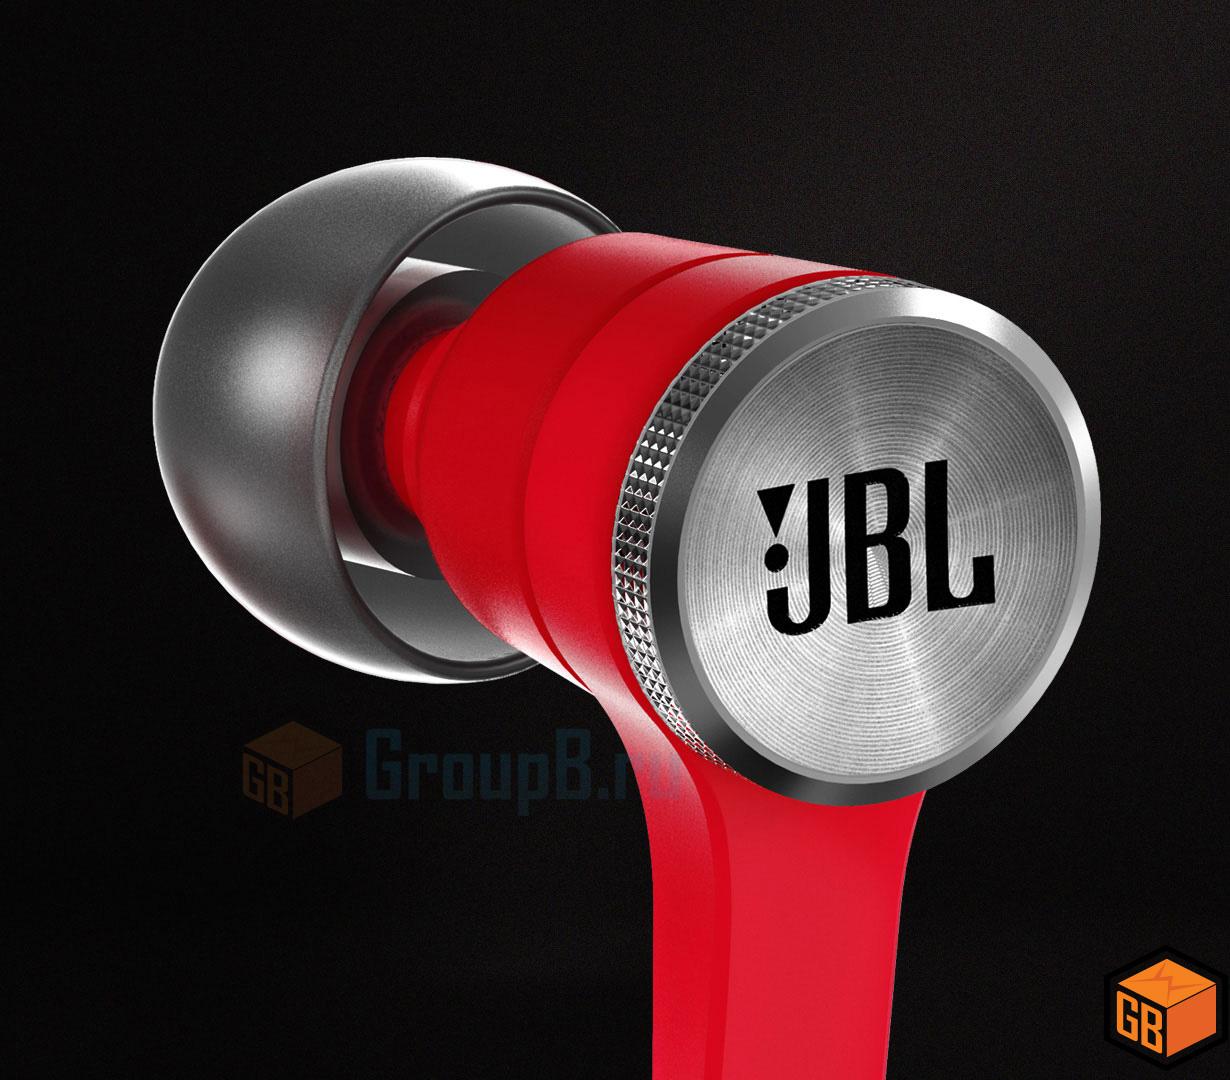 jbl e1 oneplus